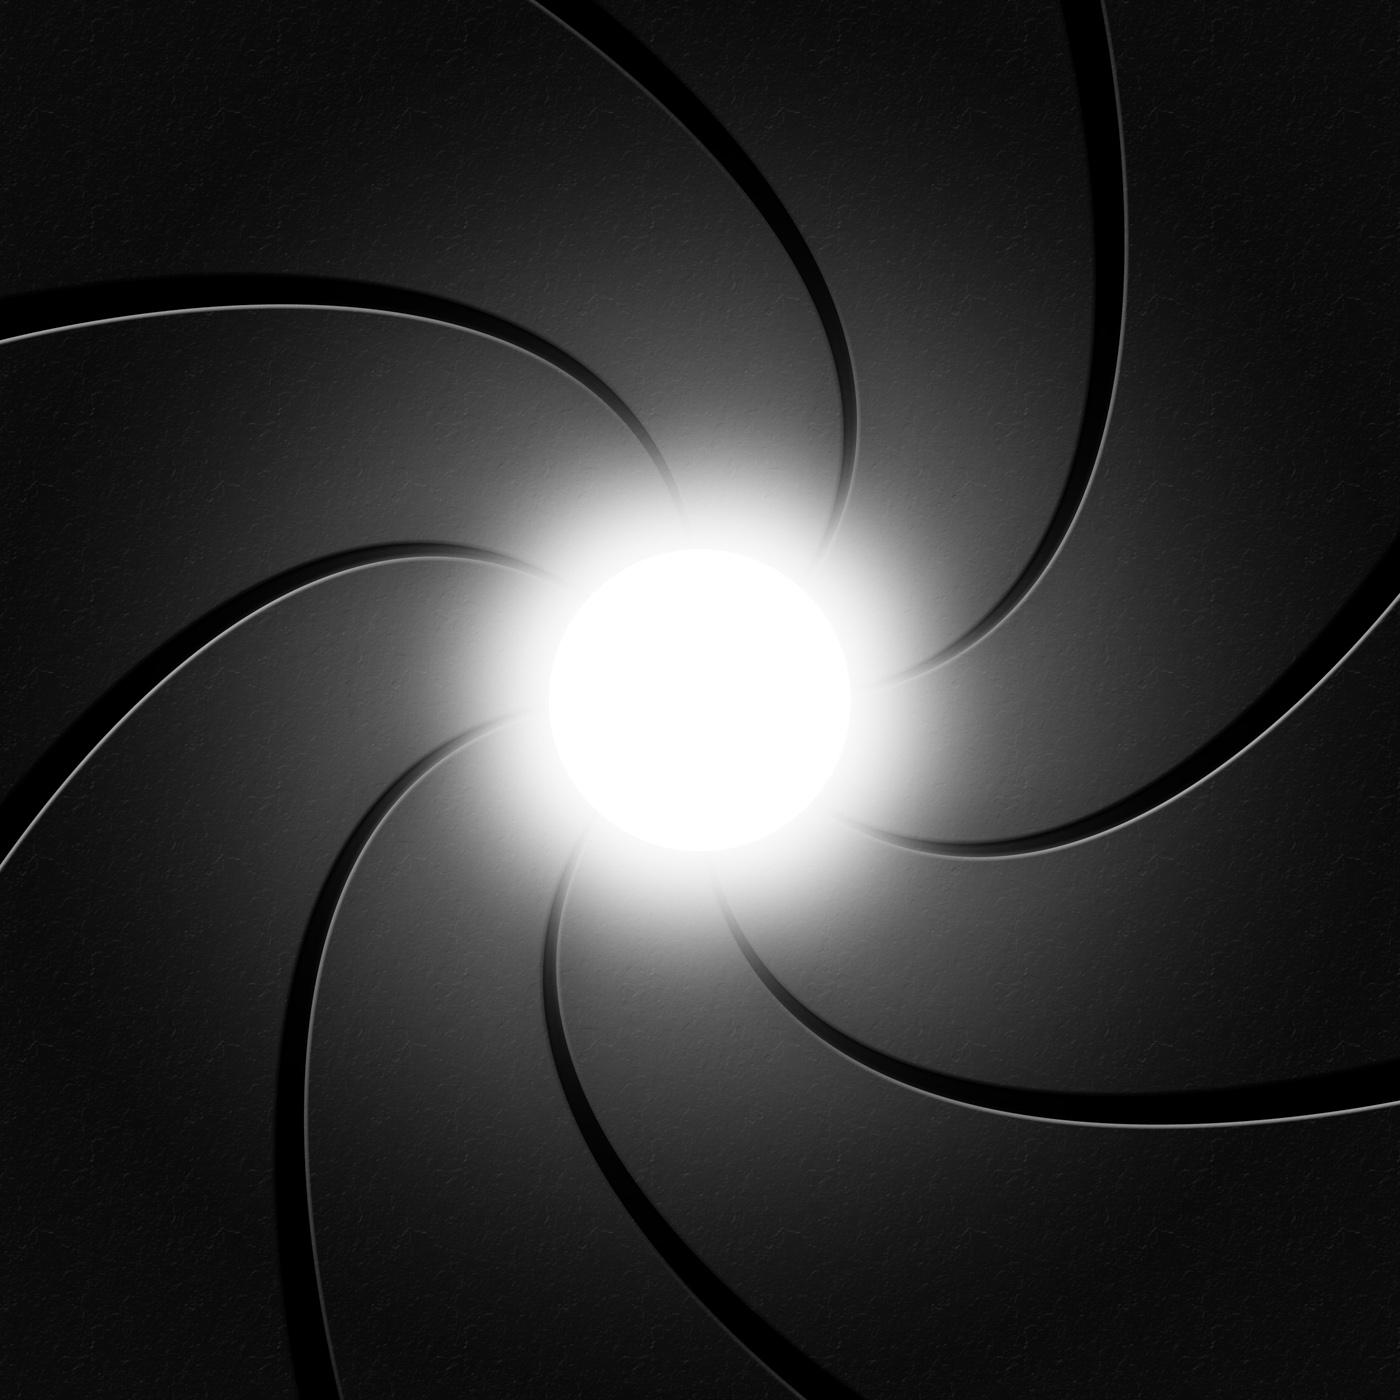 Camera Photographic Represents Shutter Spiral And Grey, Aperture, Shutter, Vortex, Twisting, HQ Photo